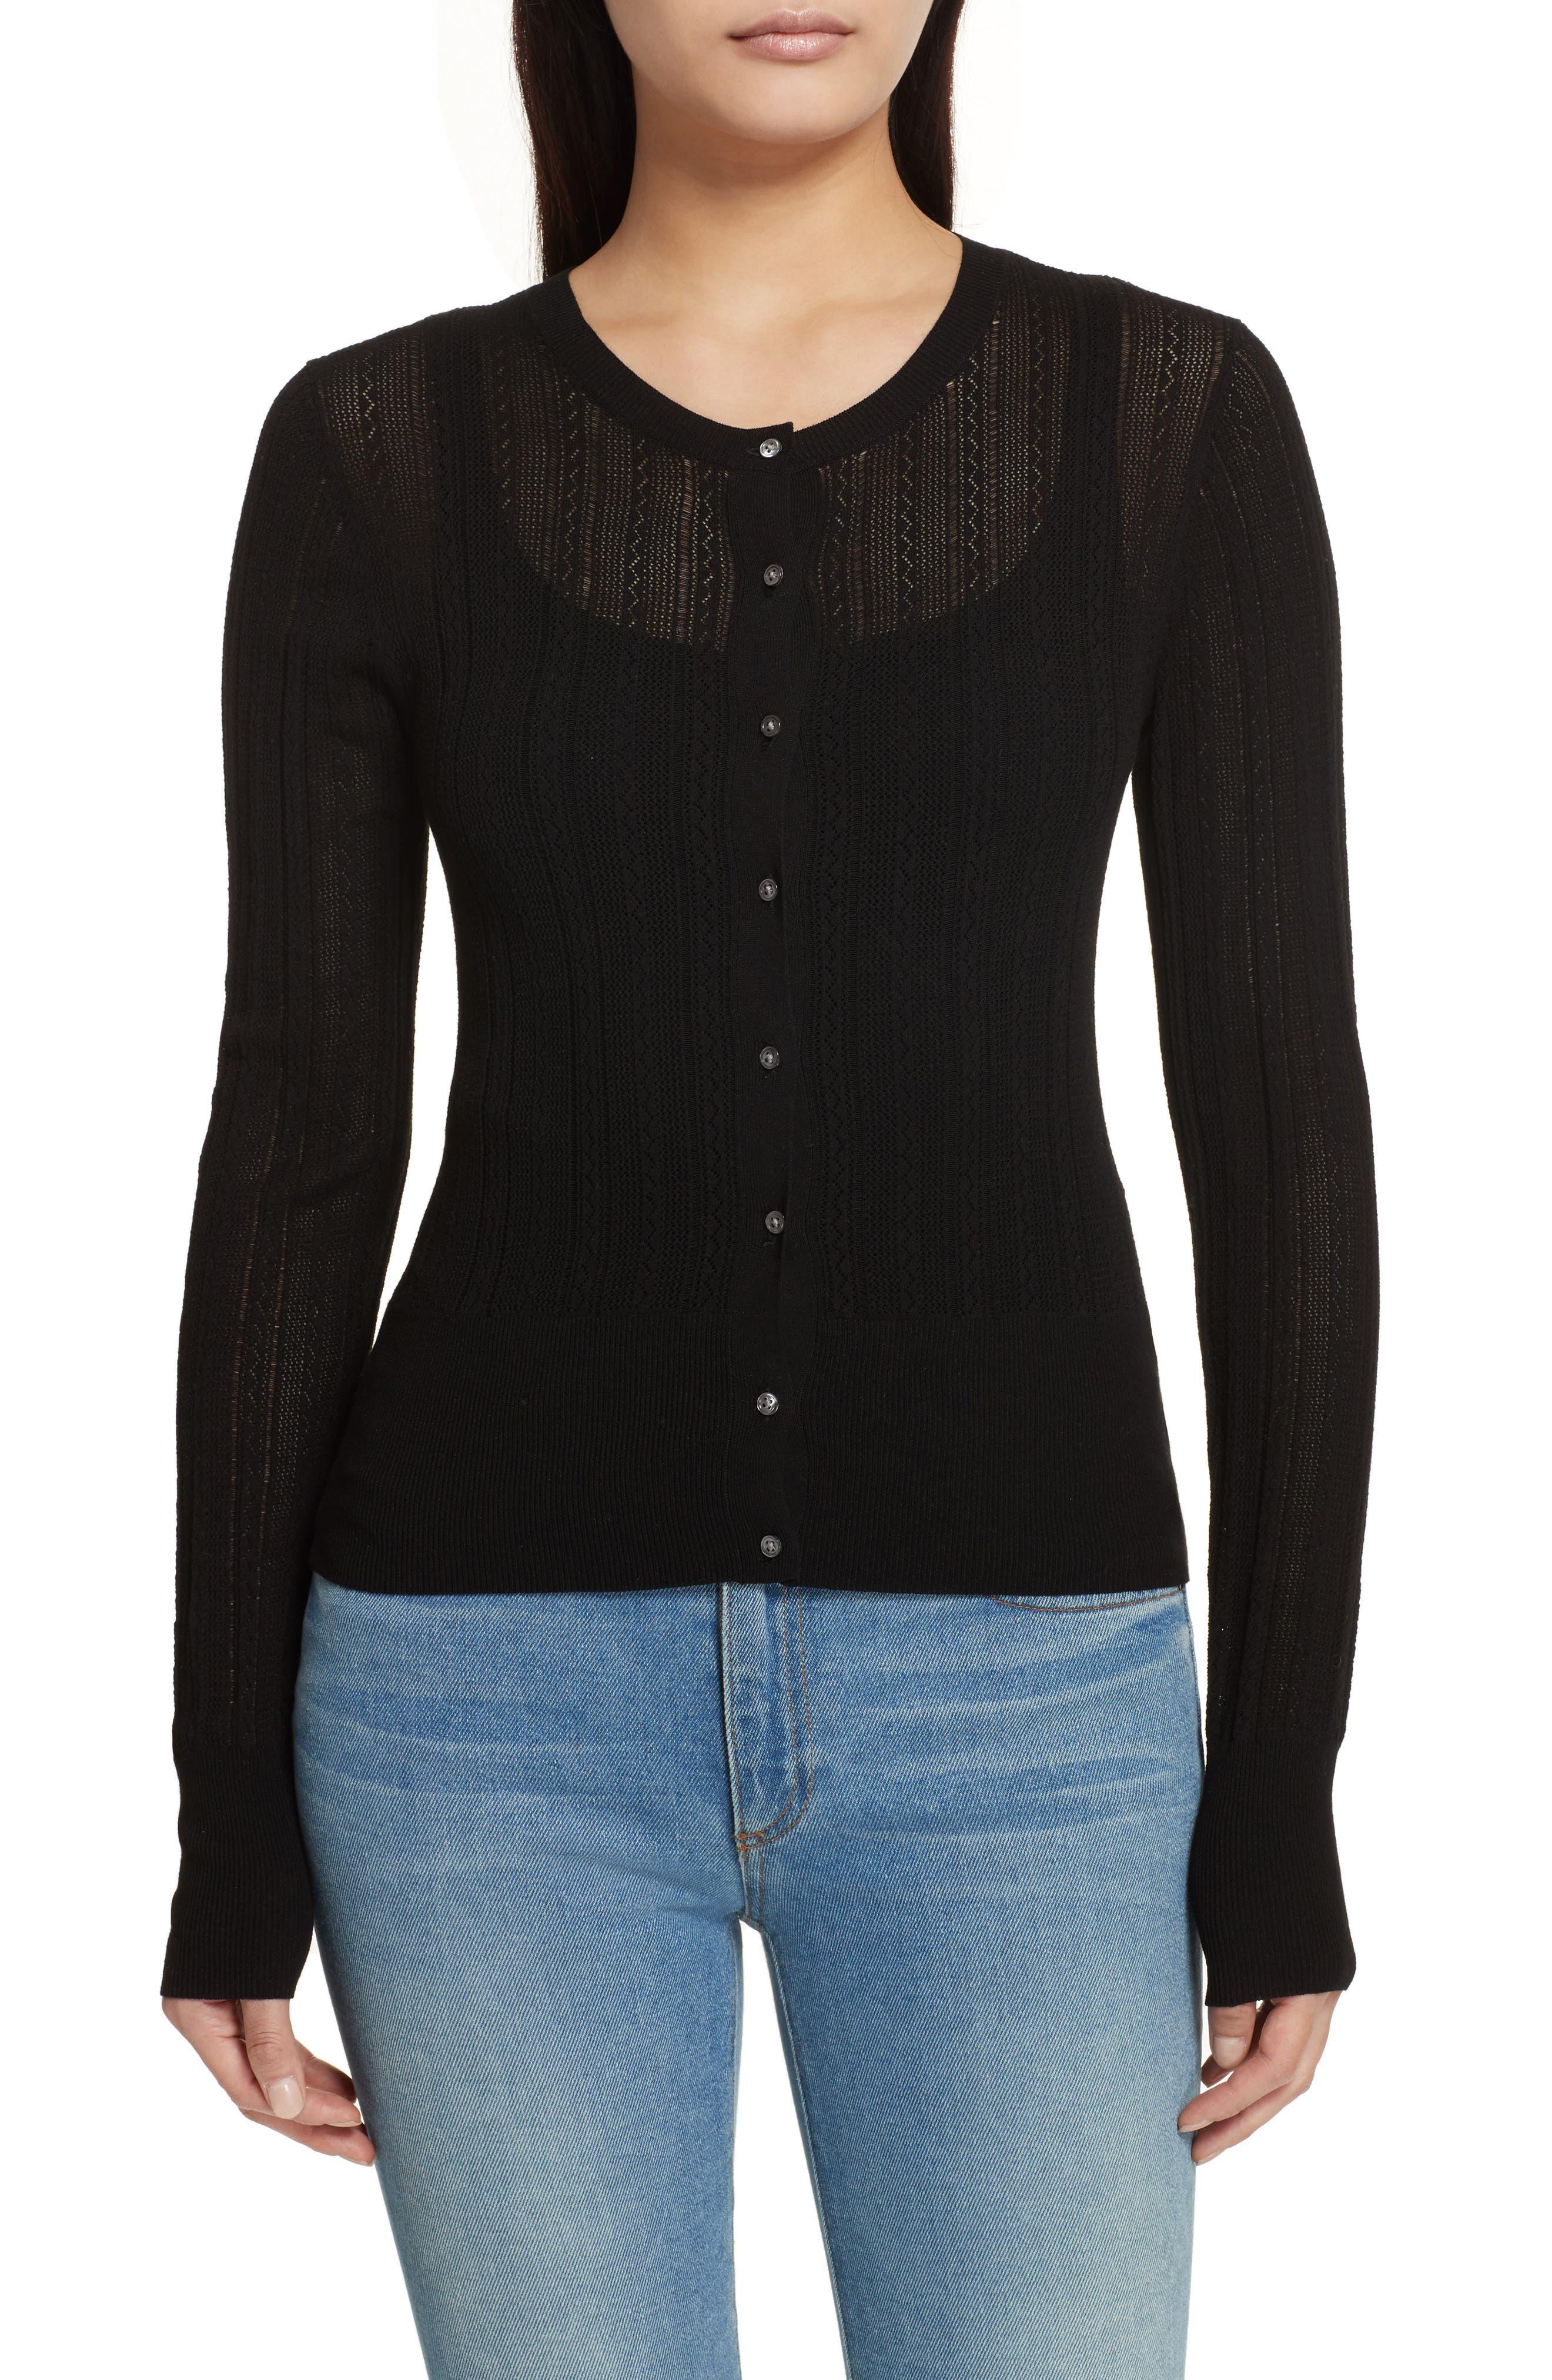 Prosecco Lace Knit Cardigan,                         Main,                         color, Black